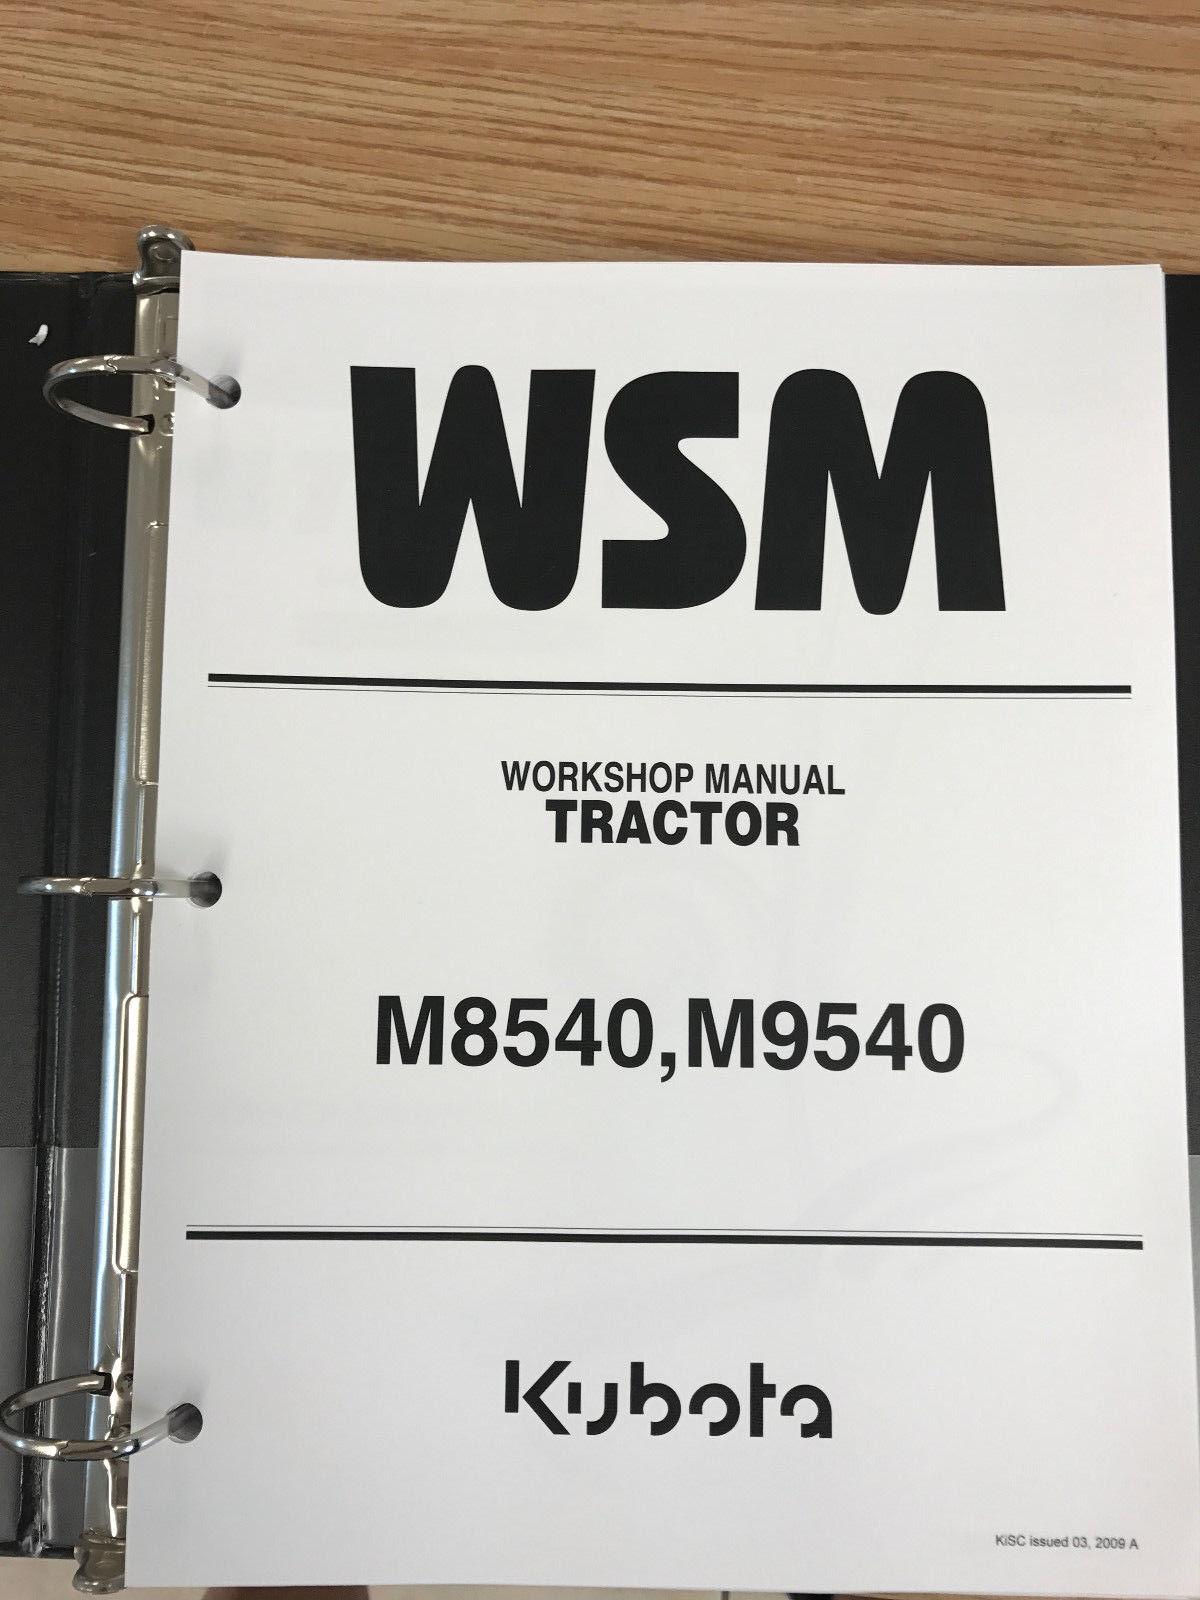 kubota m9540 wiring diagram 15 8 tramitesyconsultas co \u2022